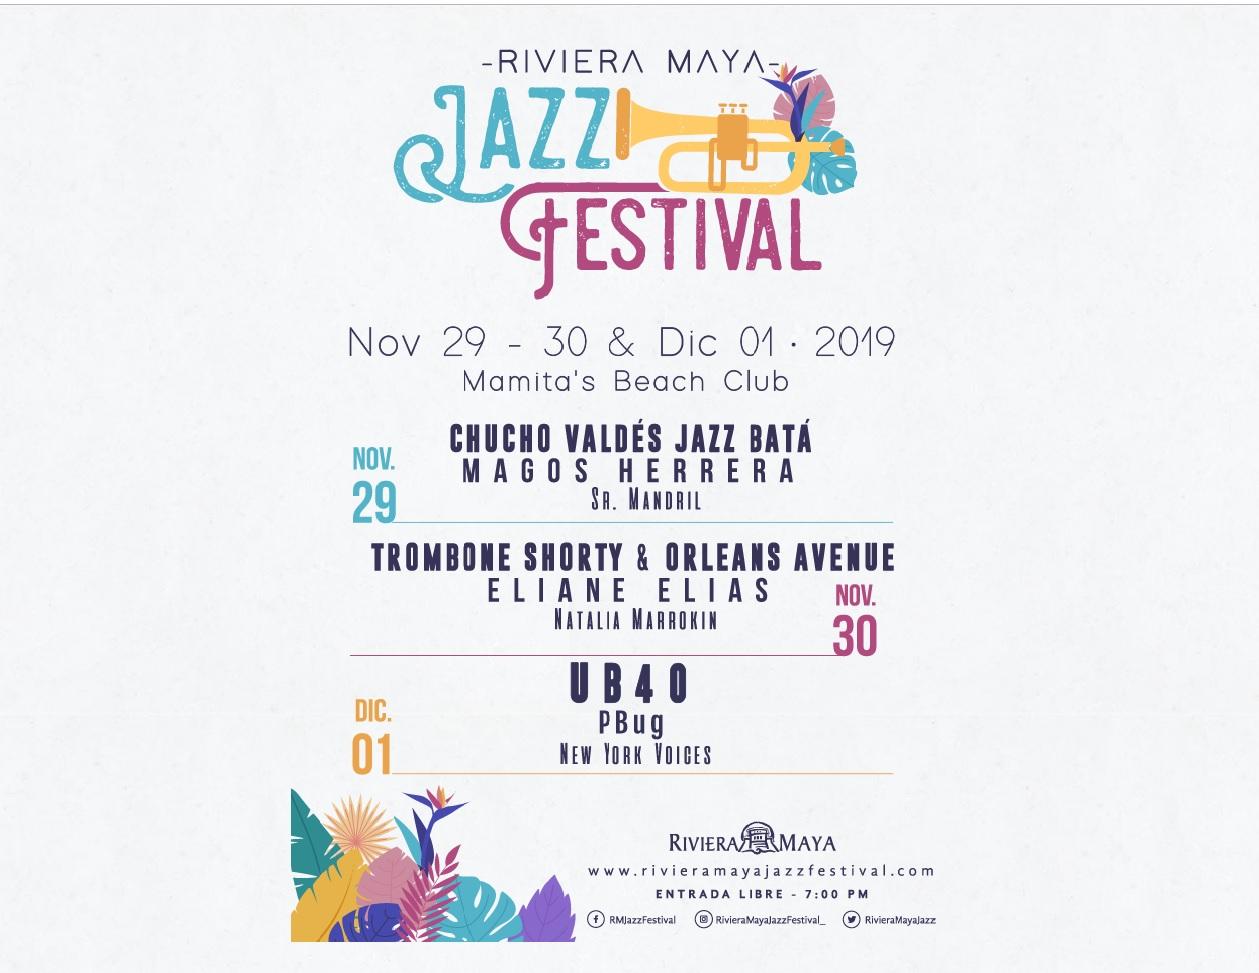 FESTIVAL JAZZ RIVIERA MAYA 2019 CPTQ 2